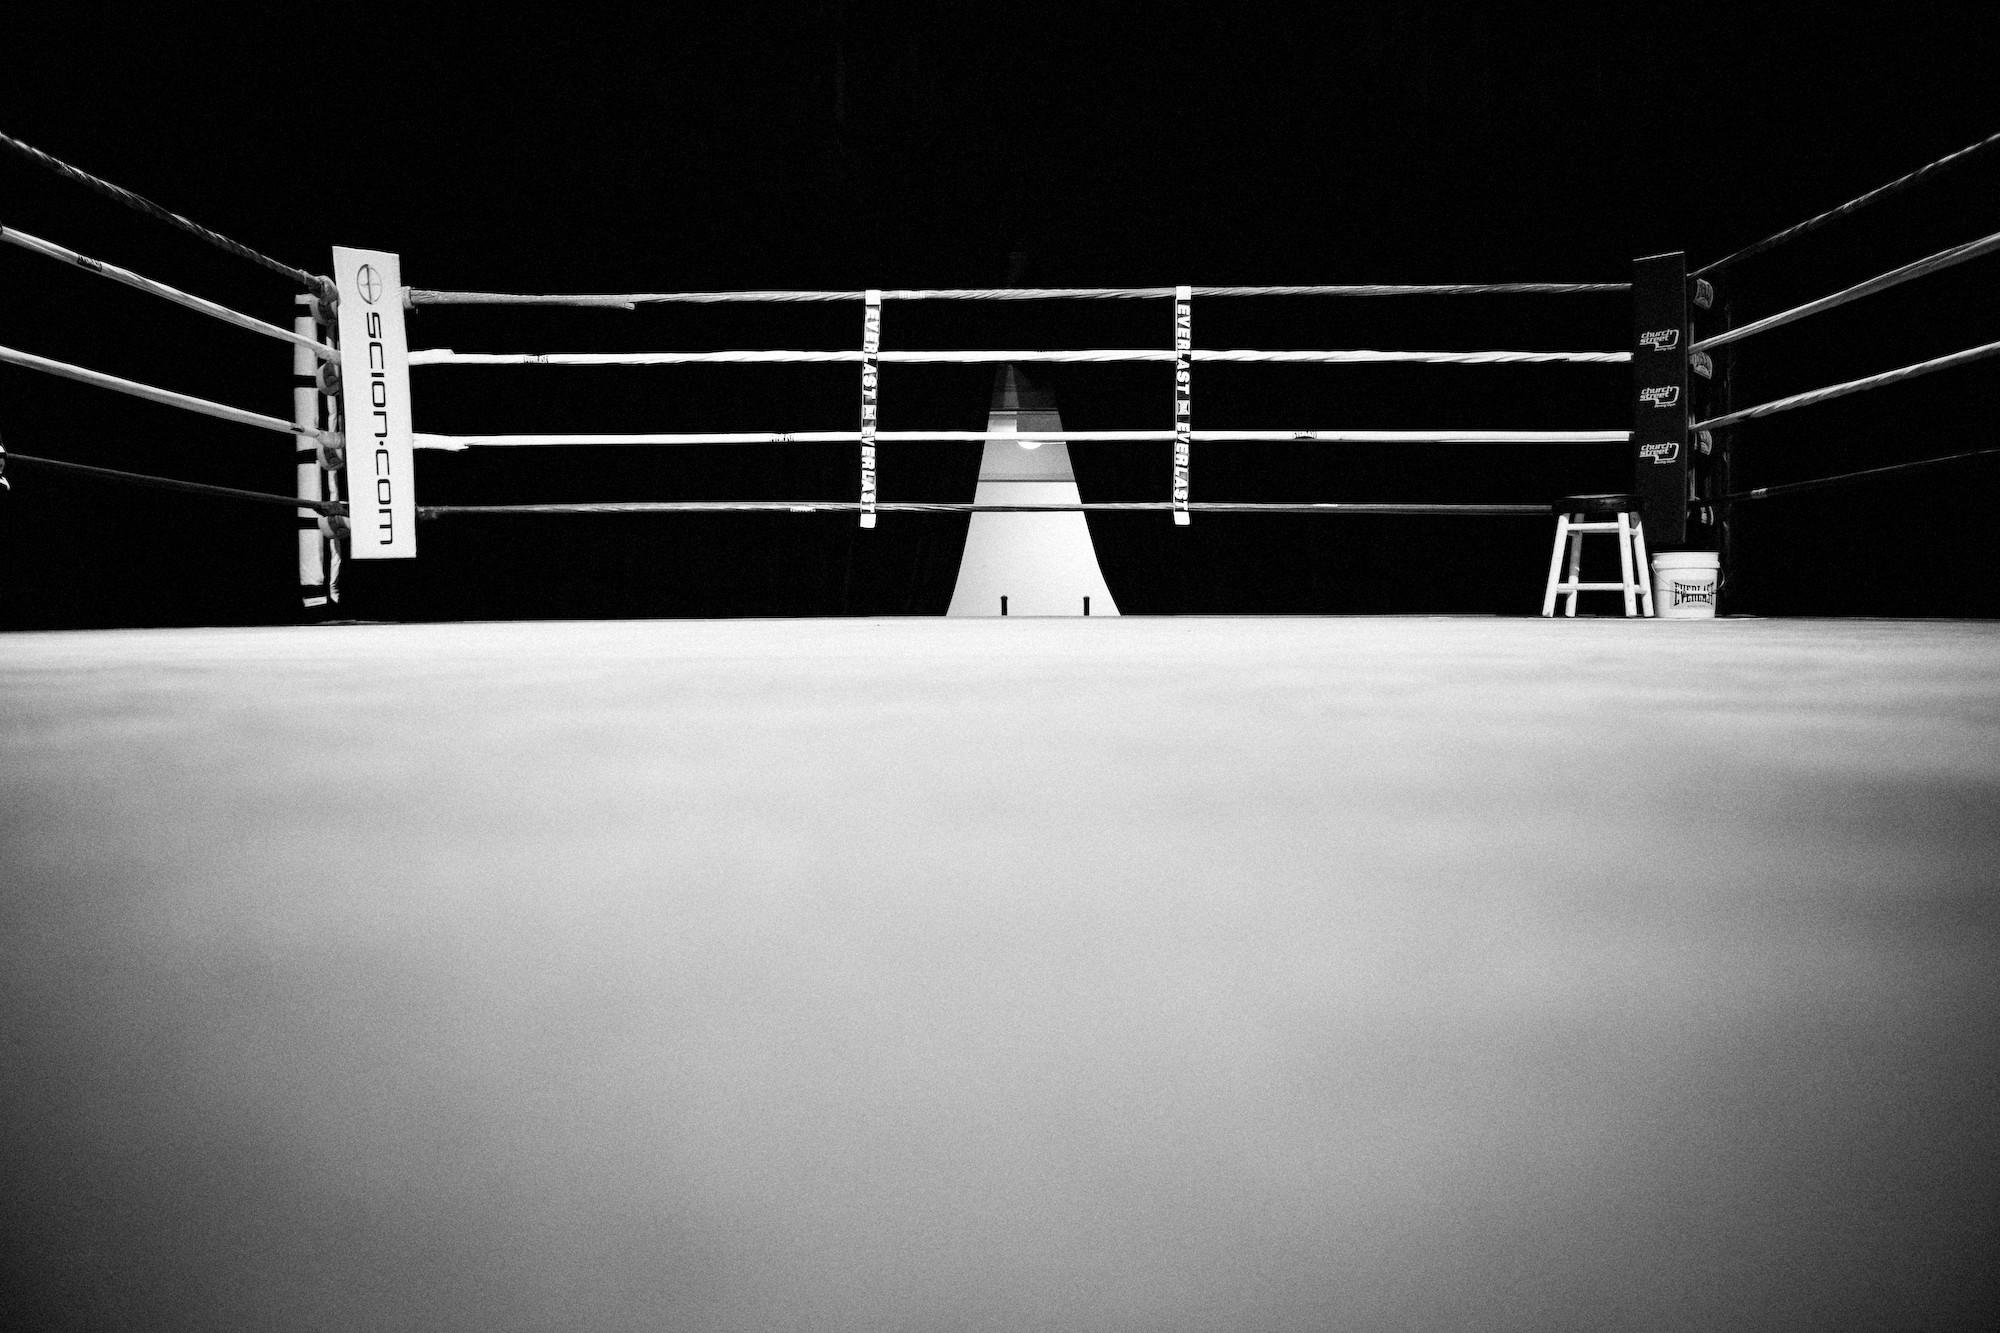 Ring De Boxeo Background